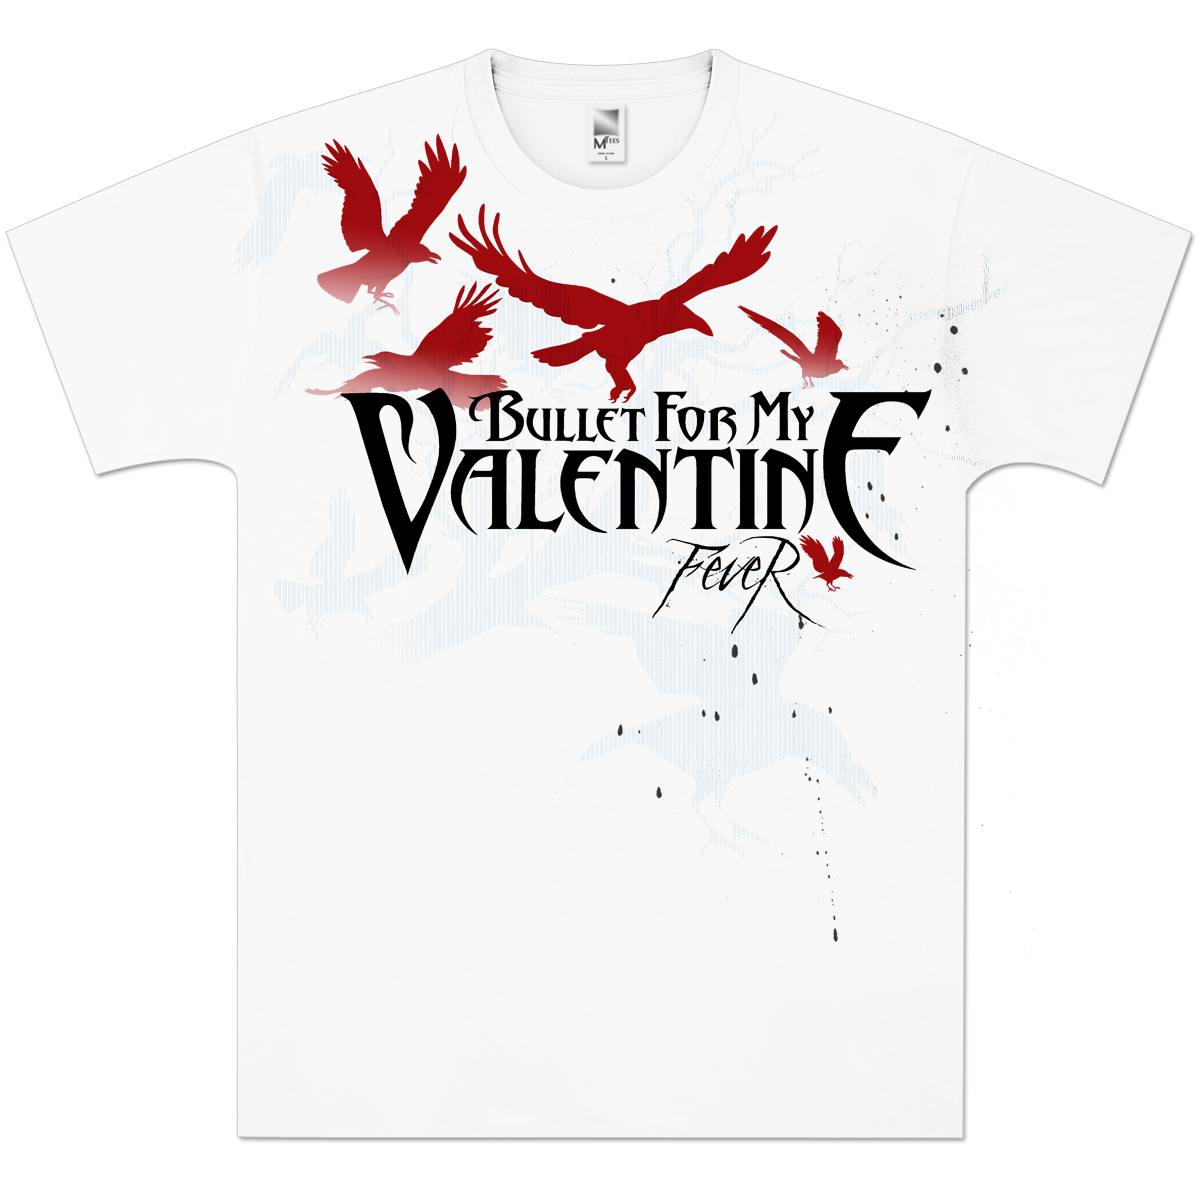 Bullet For My Valentine Fever T Shirt